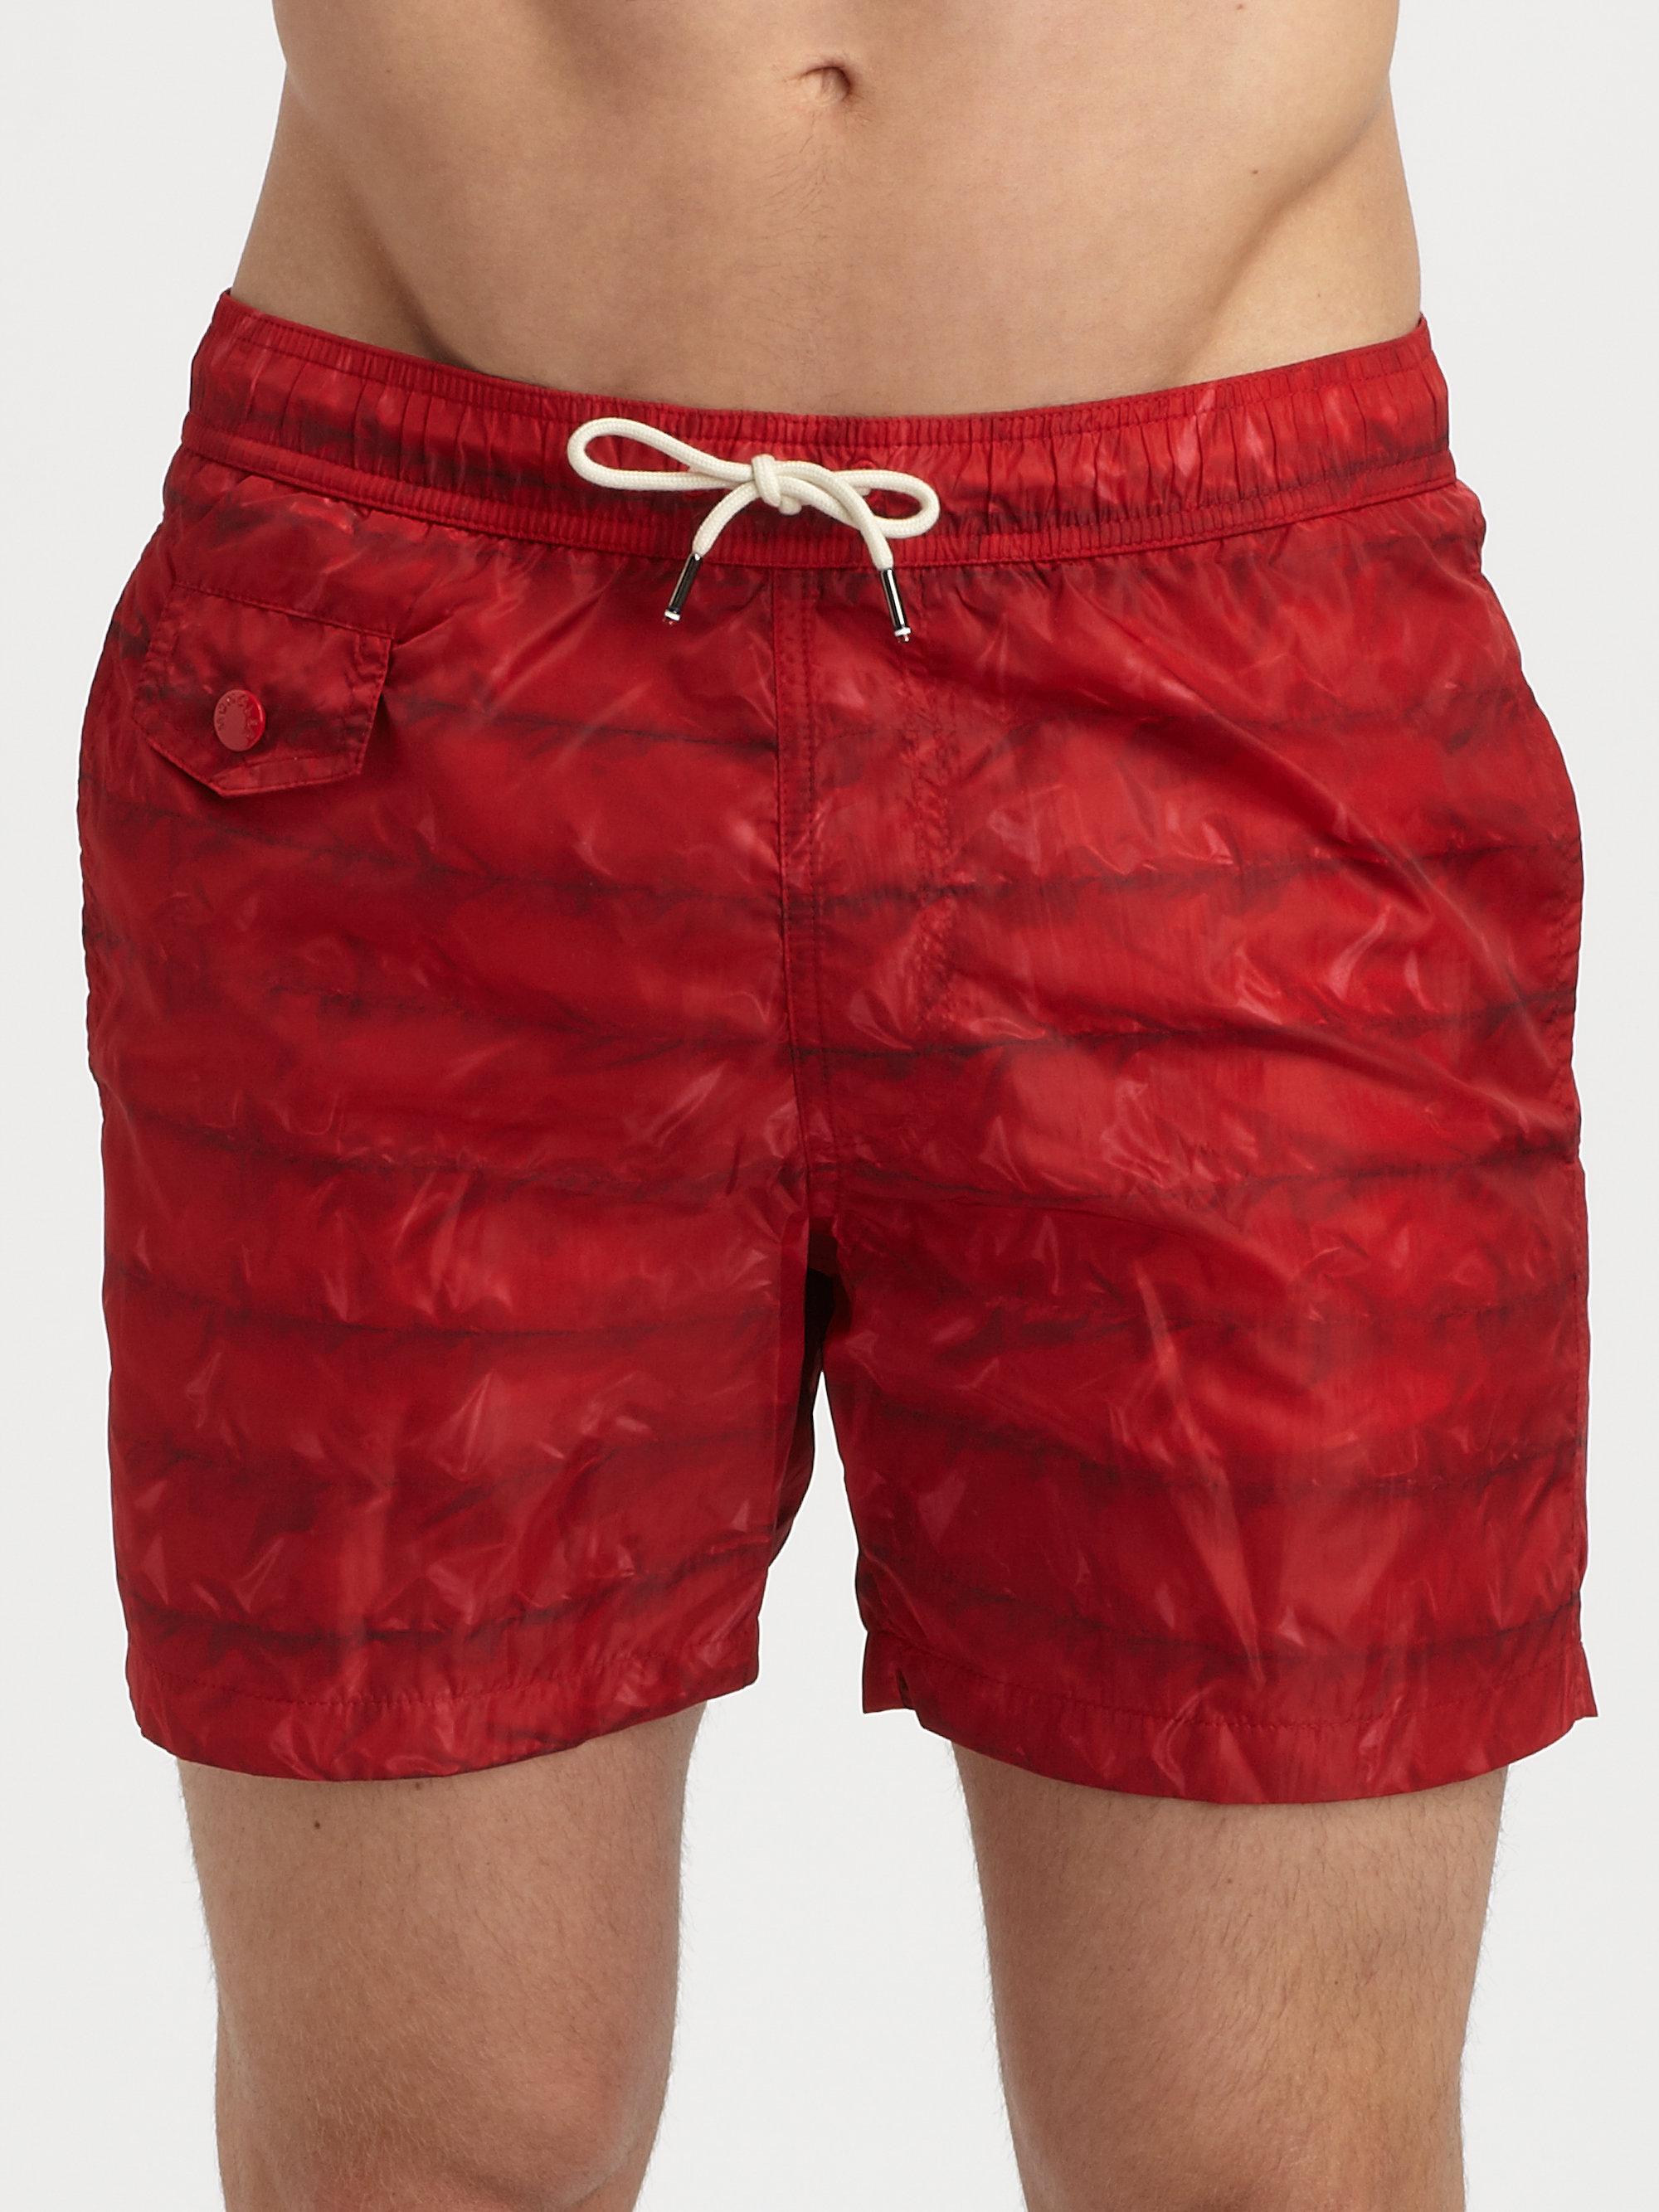 be4a66d8bc Moncler Nylon Swim Trunks in Red for Men - Lyst